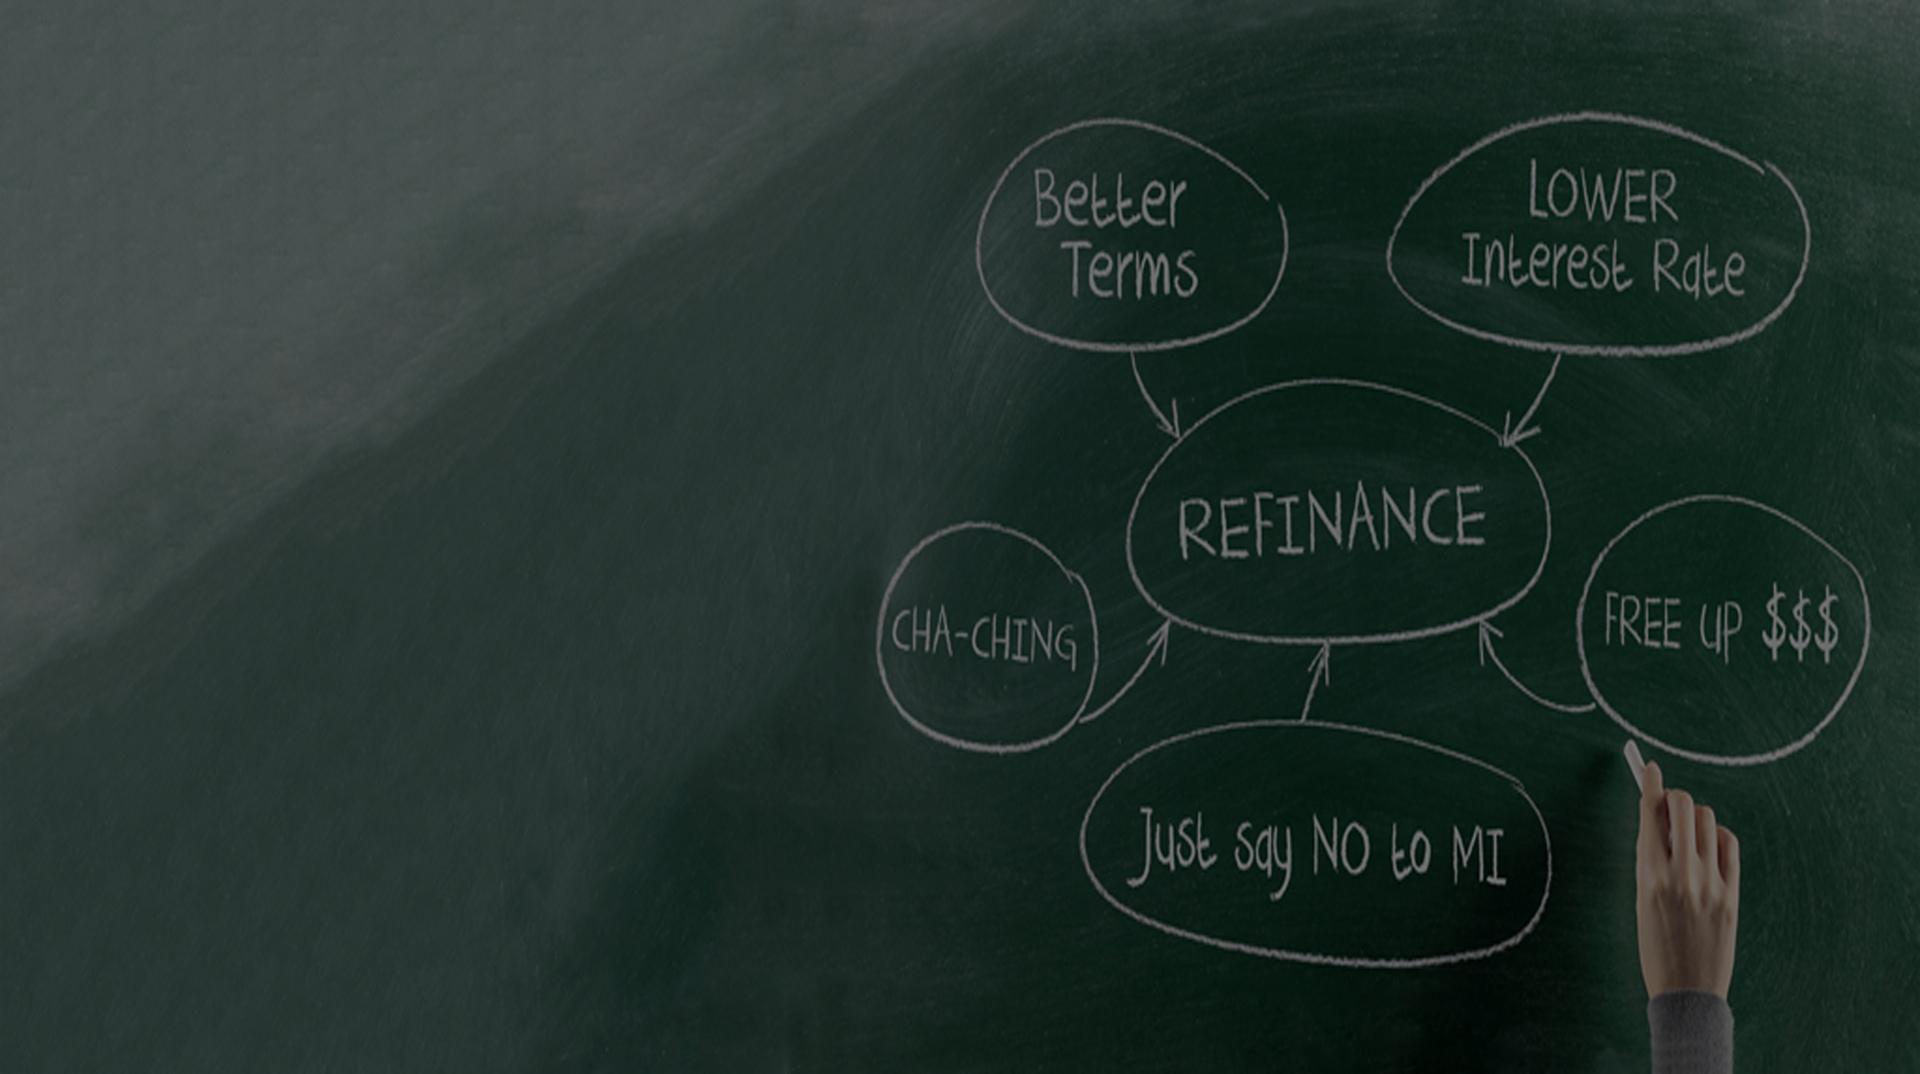 Refinance Mortgage - Mortgage Refinance - Refinance ...